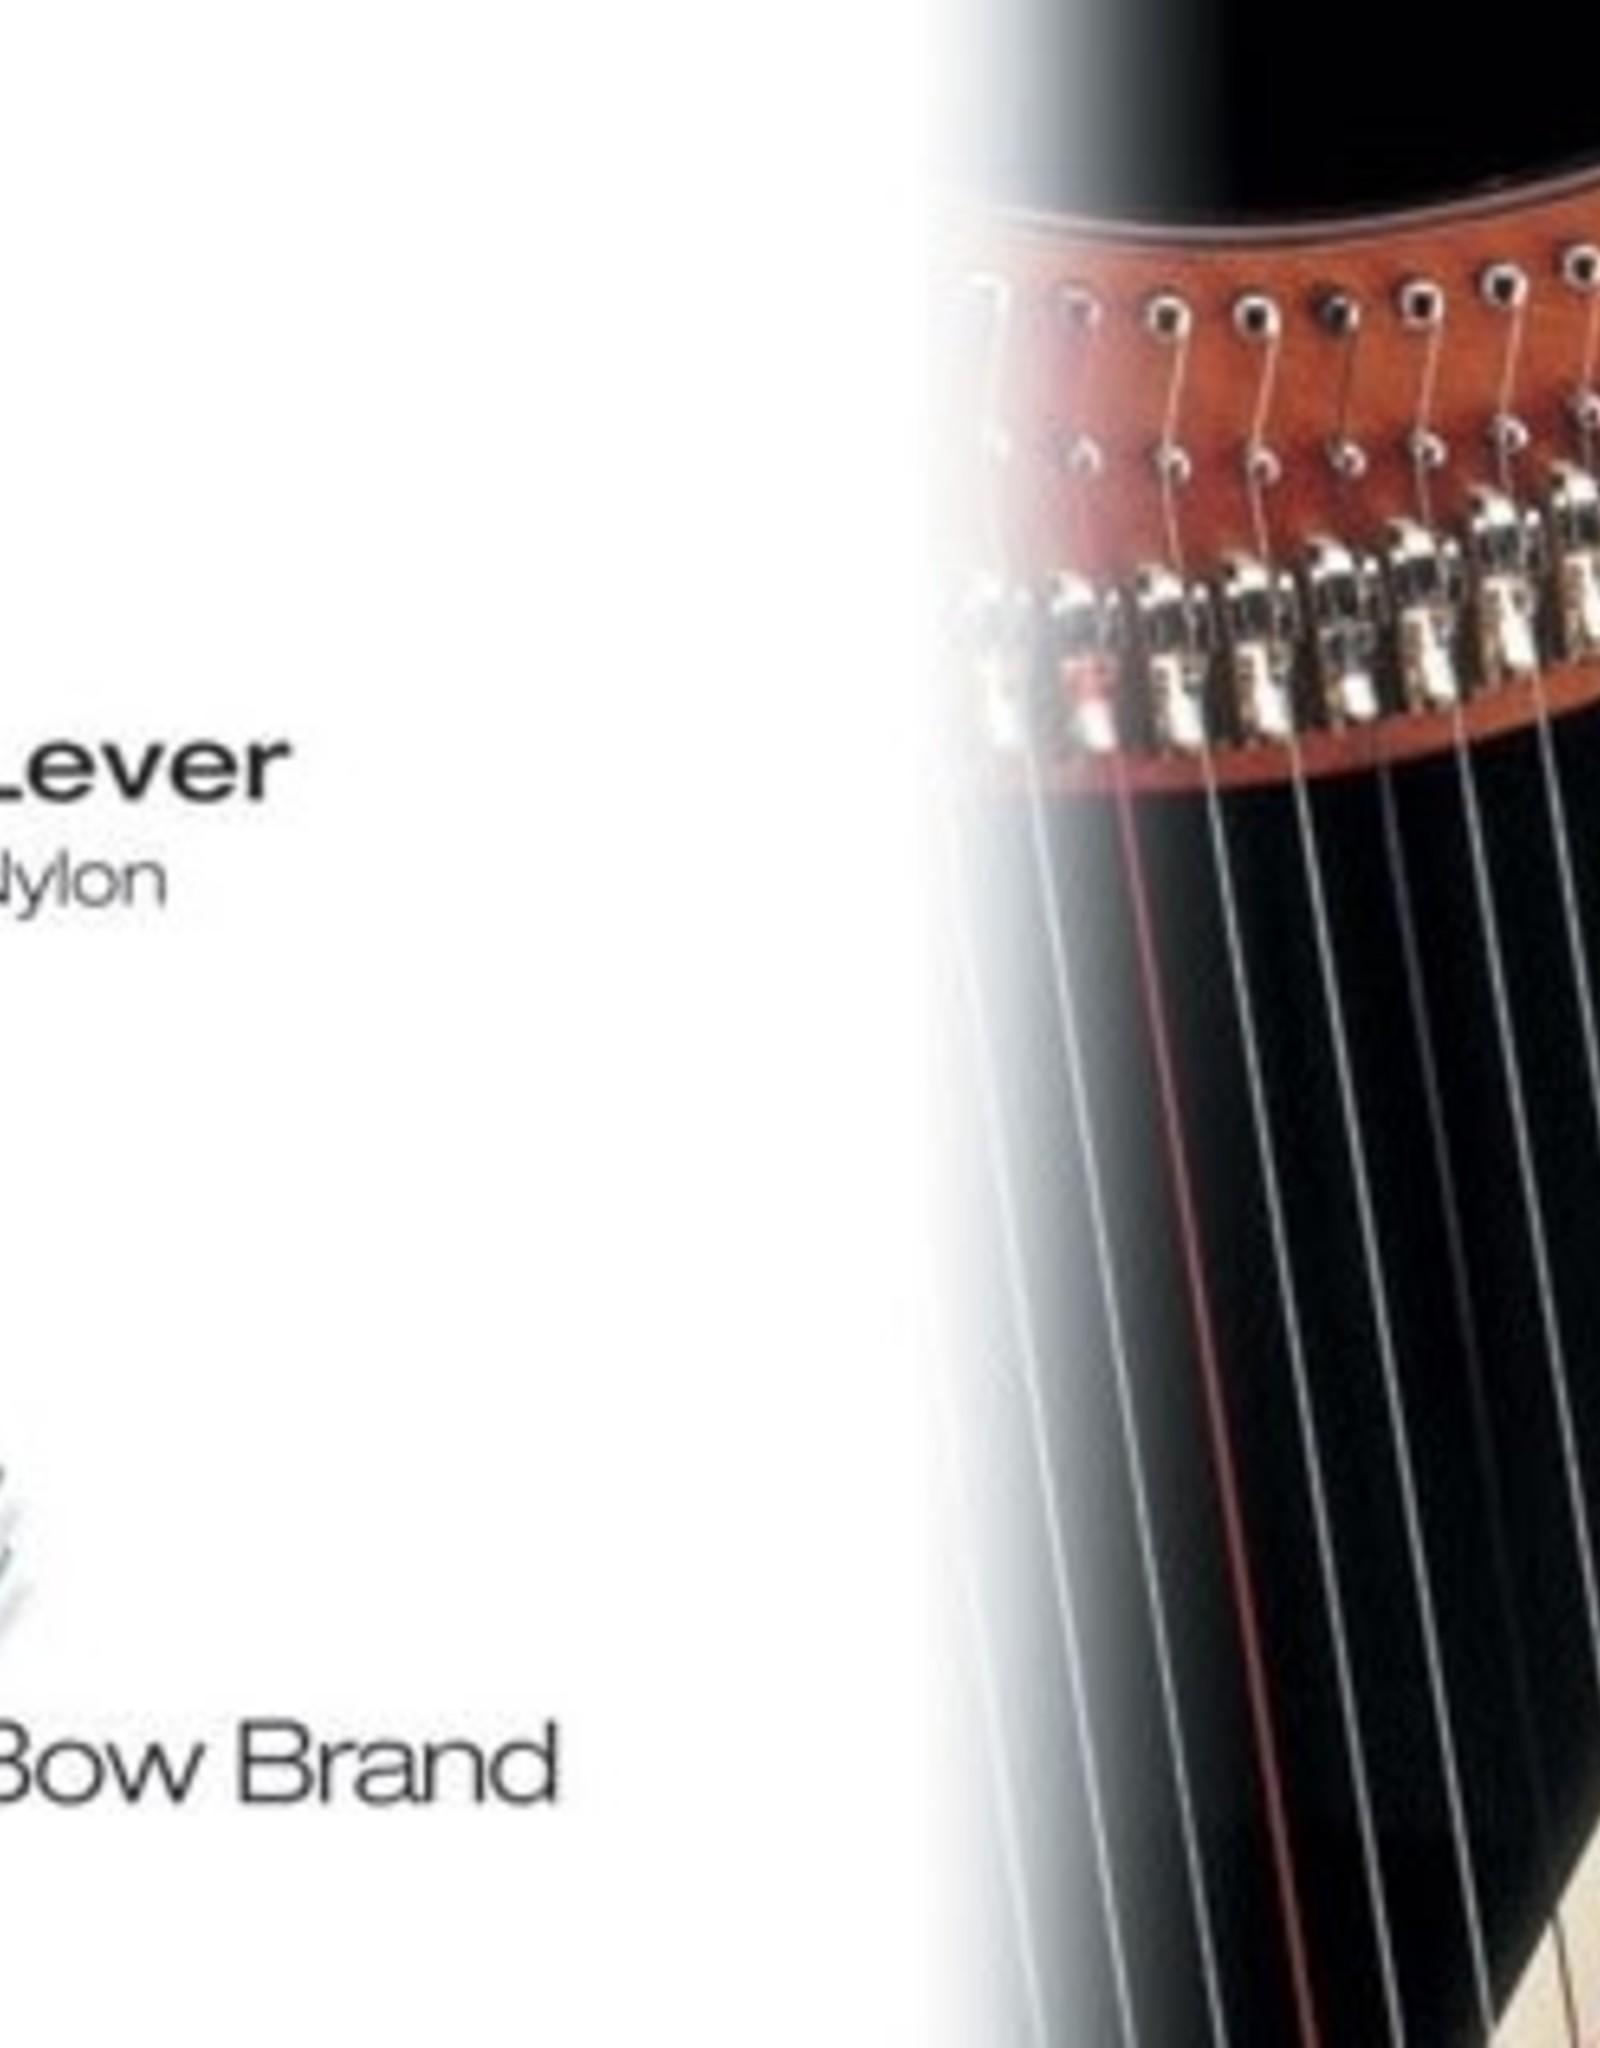 BOW BRAND  klep nylon - lever NYLON 5/1 la